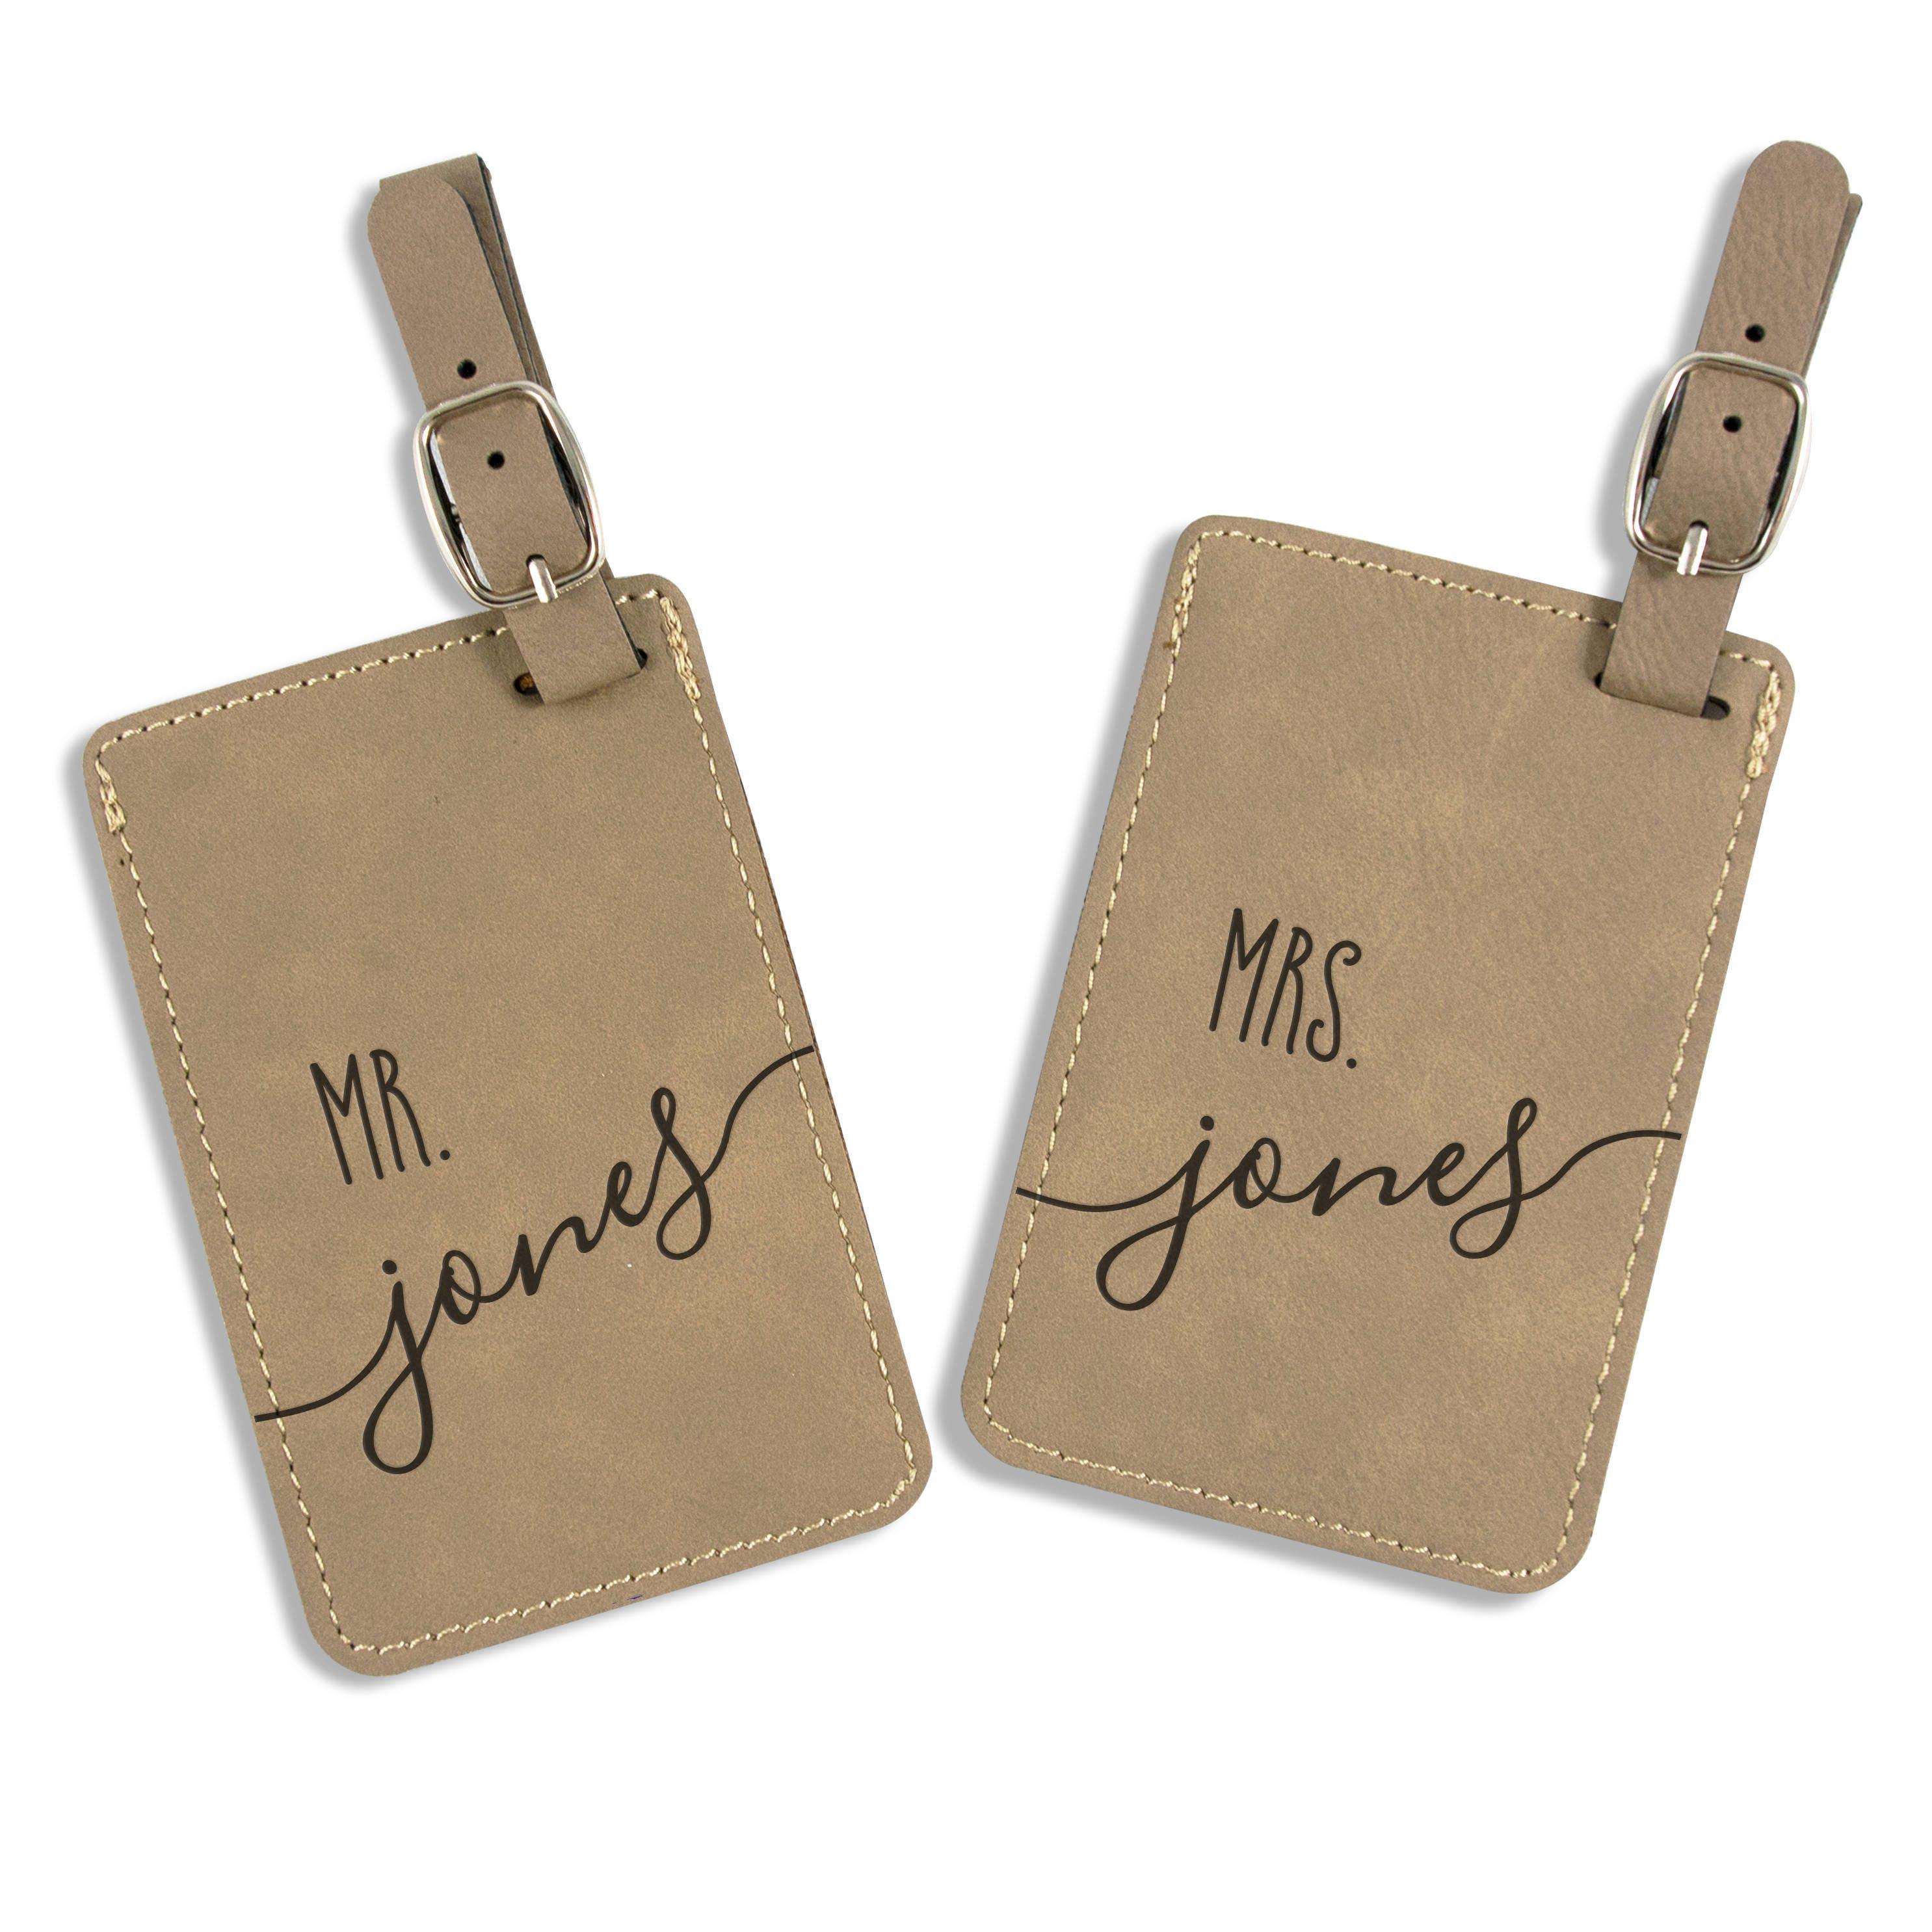 Personalized Luggage Tags Wedding Gift: Wedding Gift Personalized Luggage Tag Leatherette Bag Tag